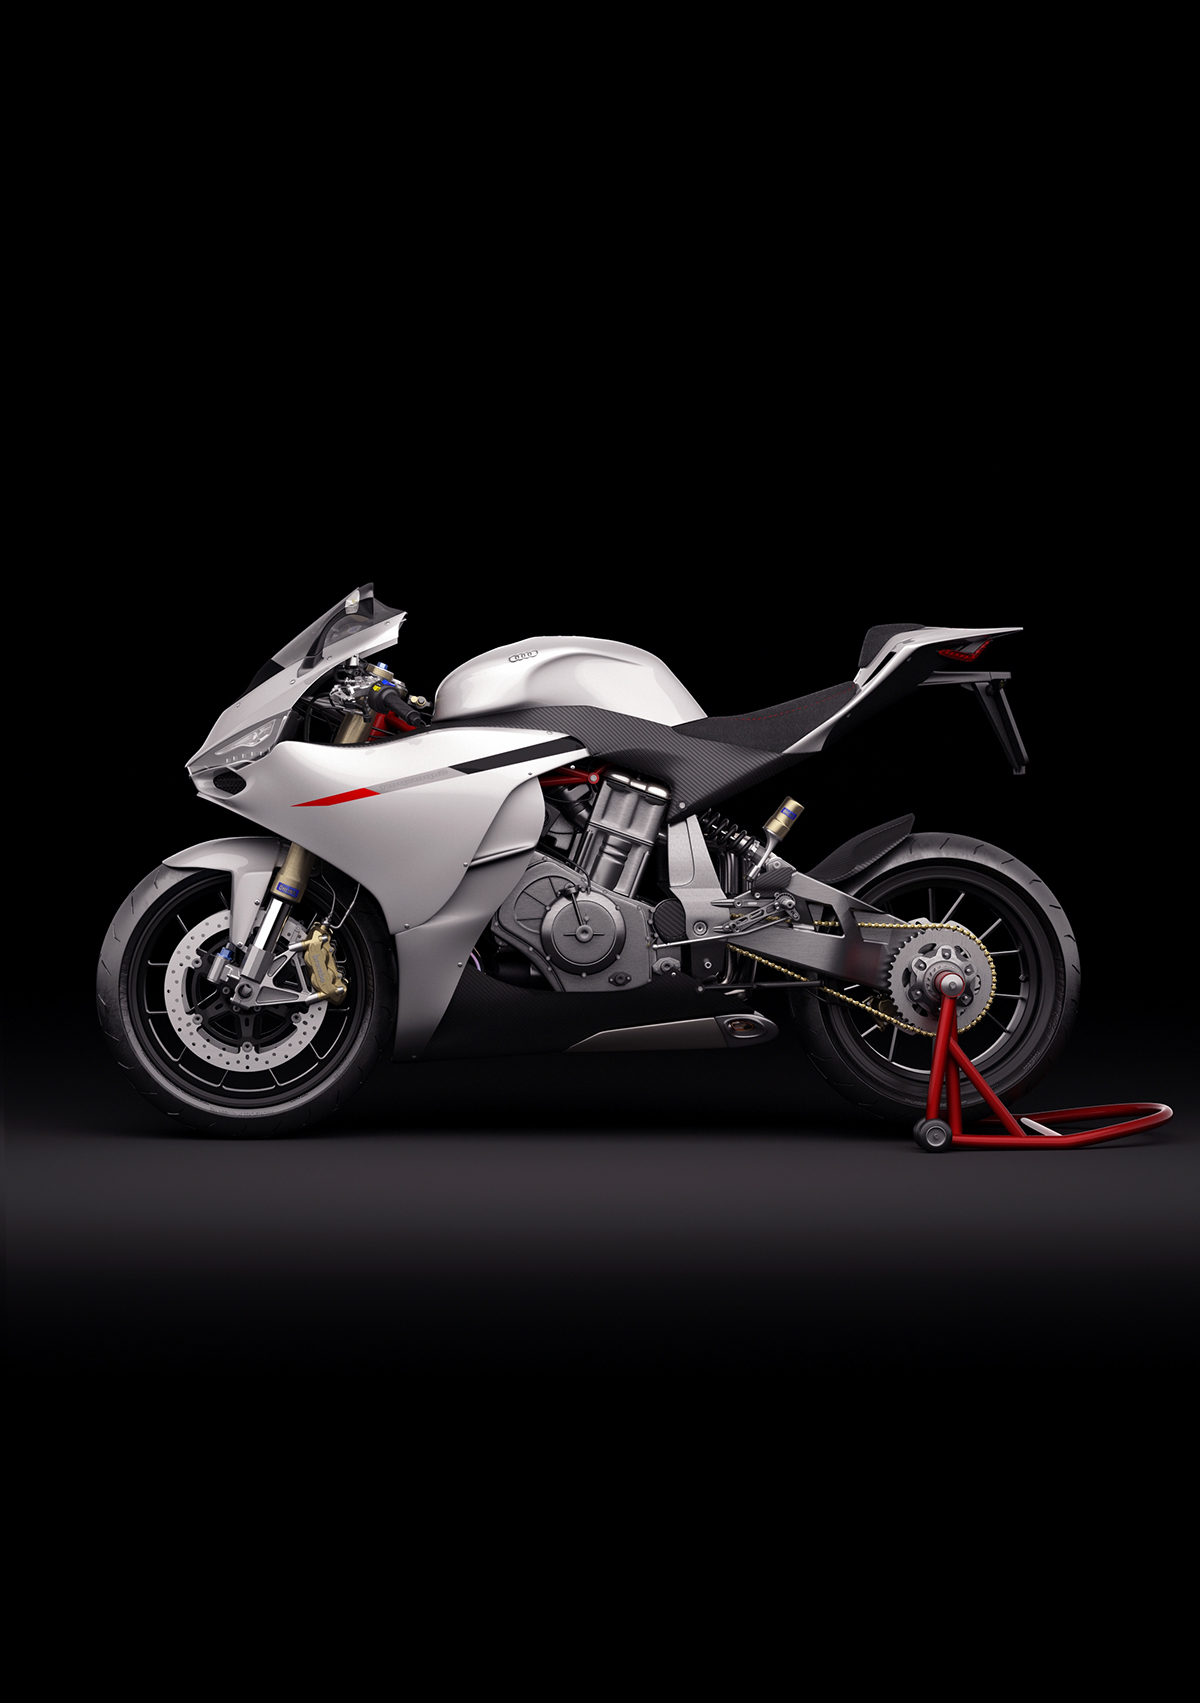 motorbike motocycle Bike superbike Audi design Alessandro Lupo 3D concept